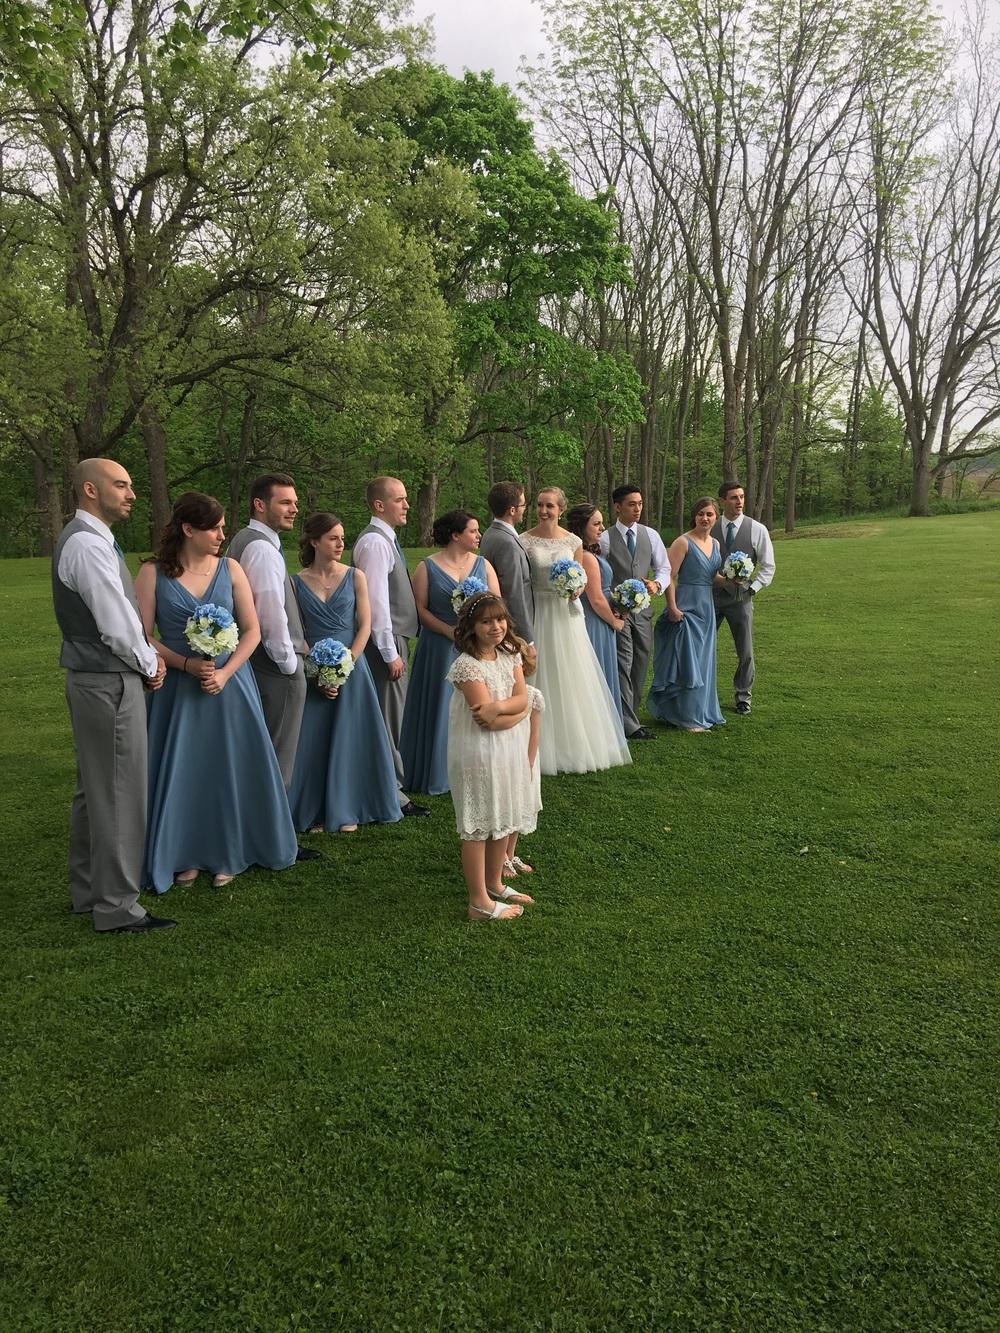 Beautiful wedding party made for beautiful shots.